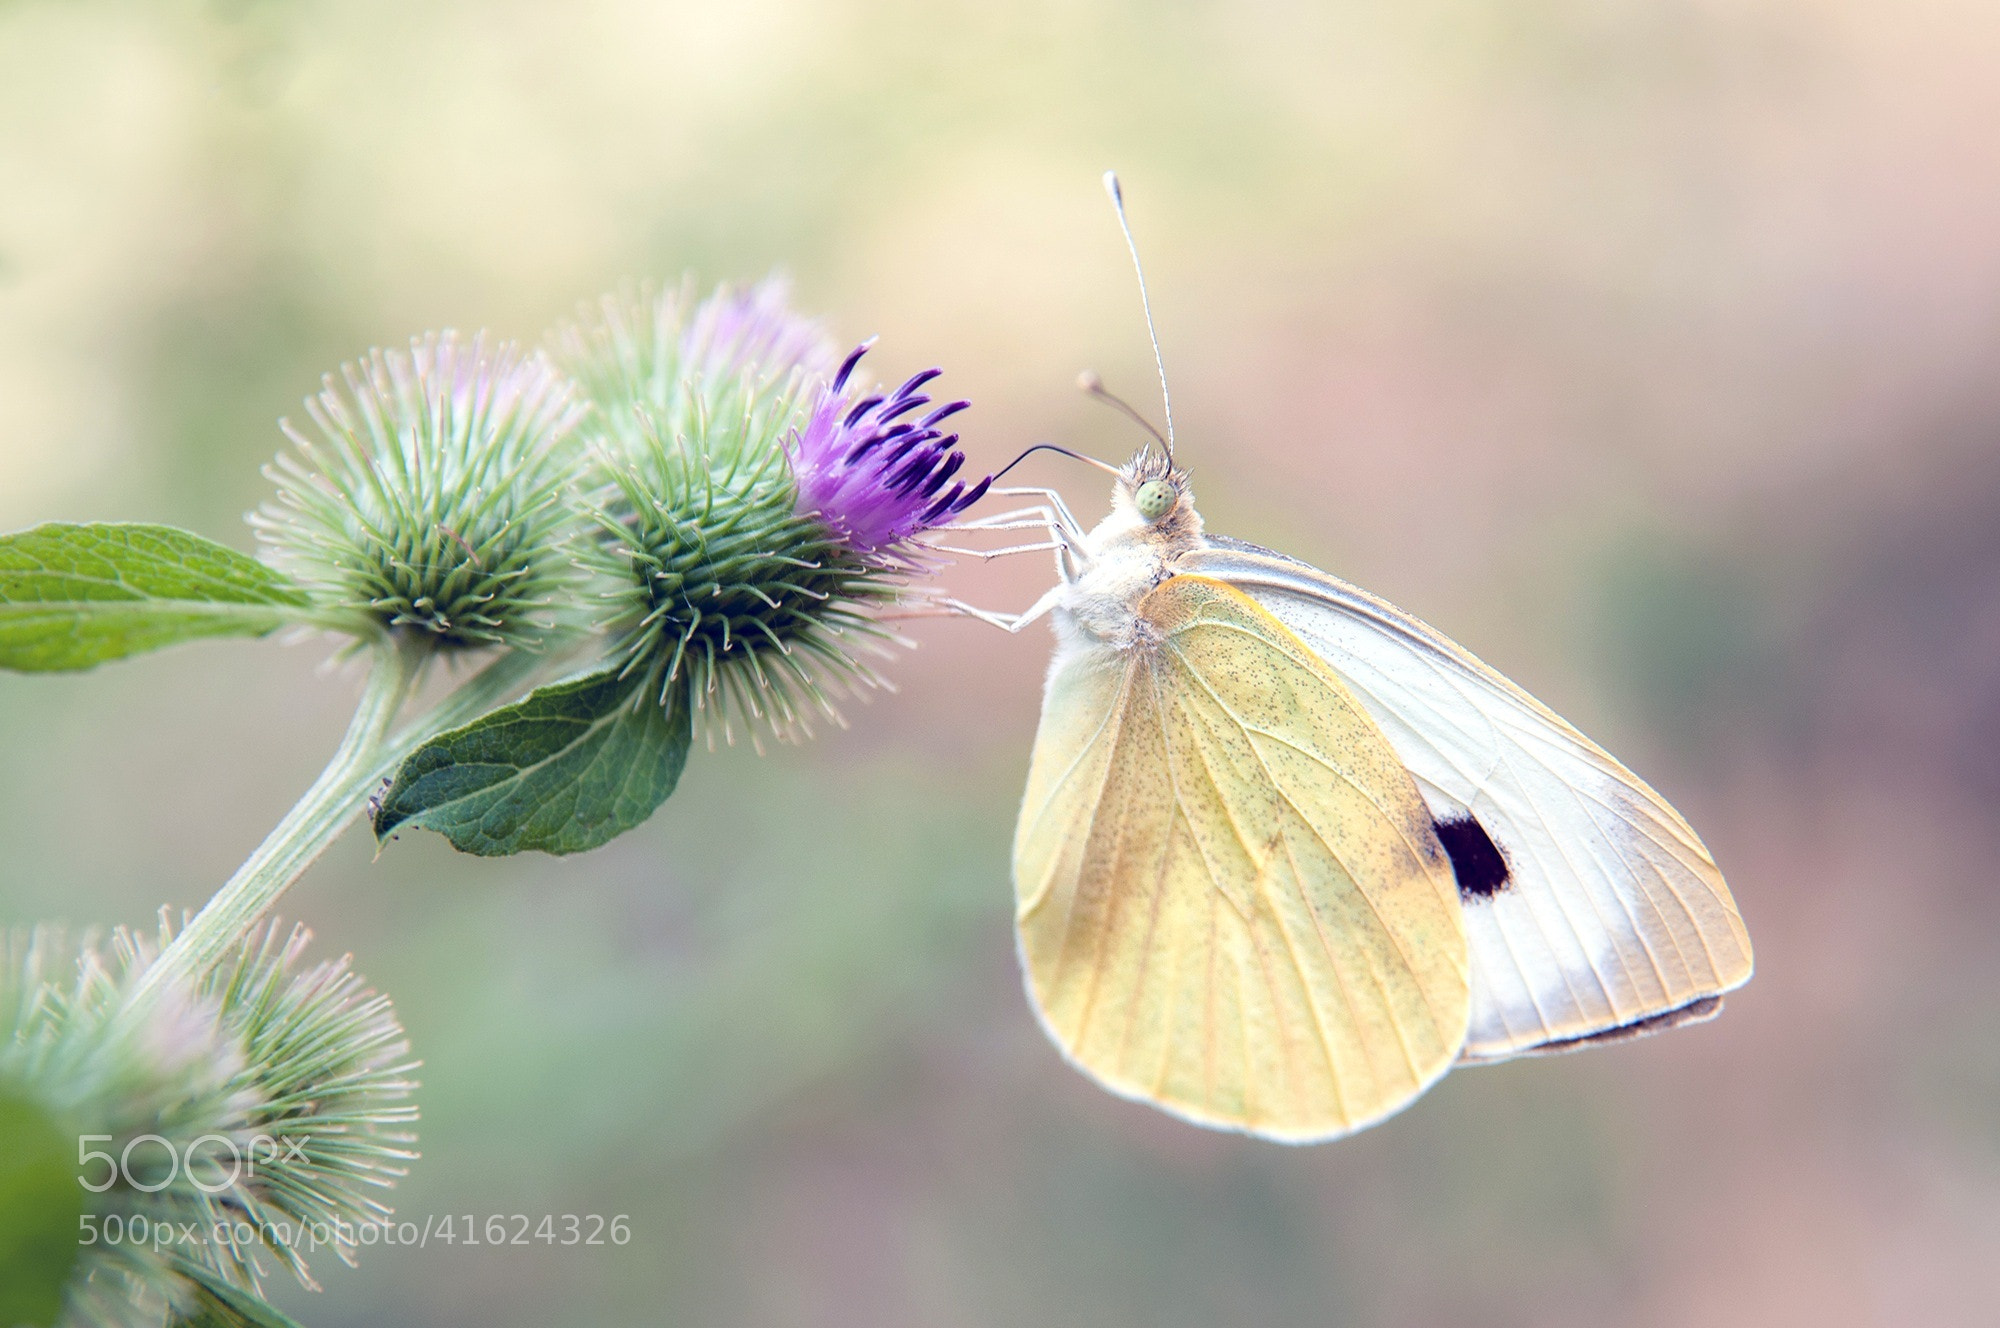 Photograph Butterflies in Freedom XVIII. by Juan Dorado on 500px